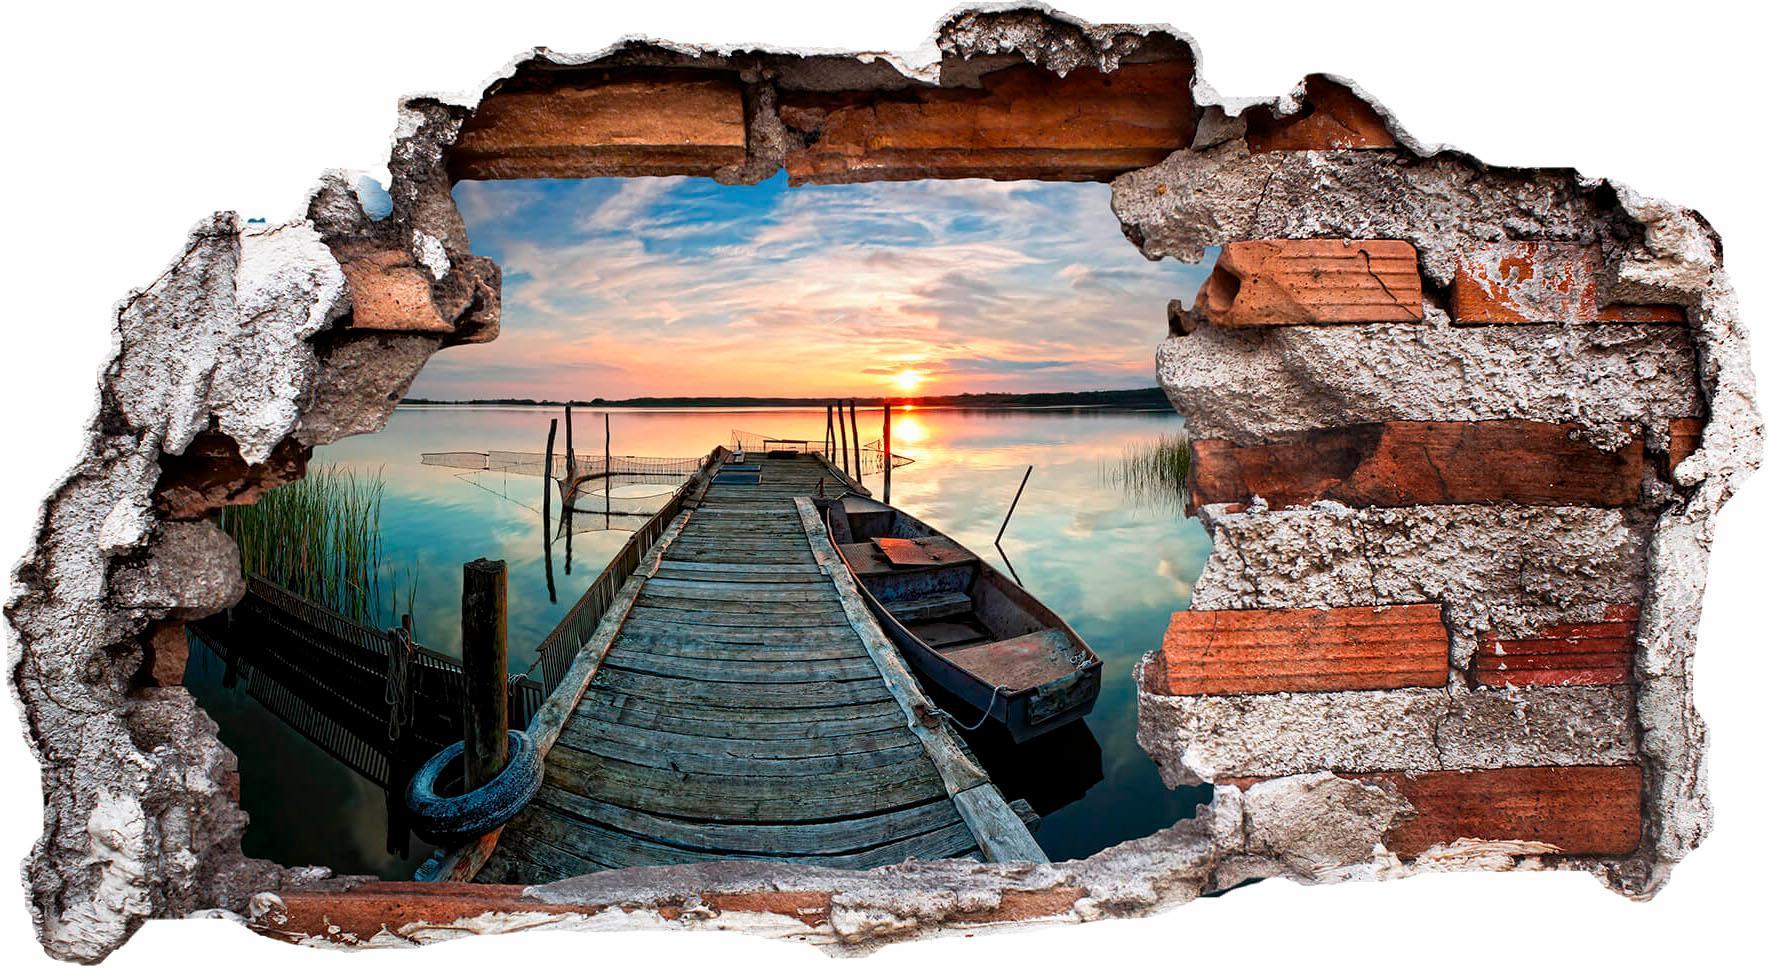 Wandtattoo Sunset at the lake Wohnen/Accessoires & Leuchten/Wohnaccessoires/Wandtattoos und Wandsticker/Wandtattoos Natur